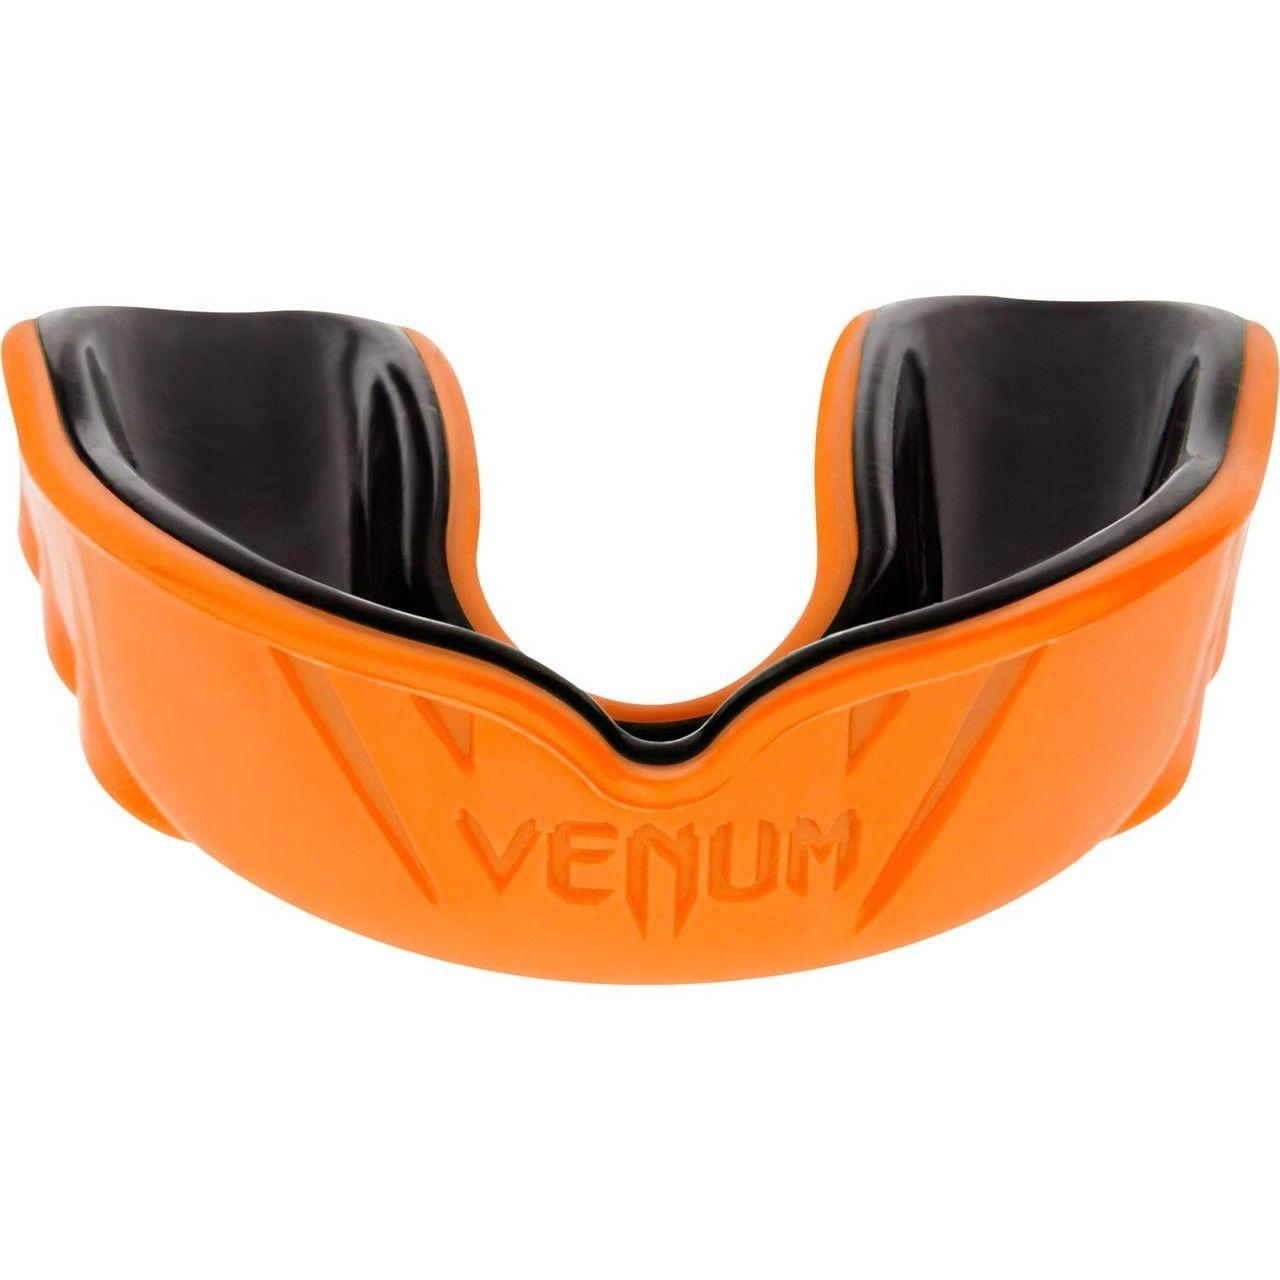 Venum Challenger Mouthguard Black//Orange